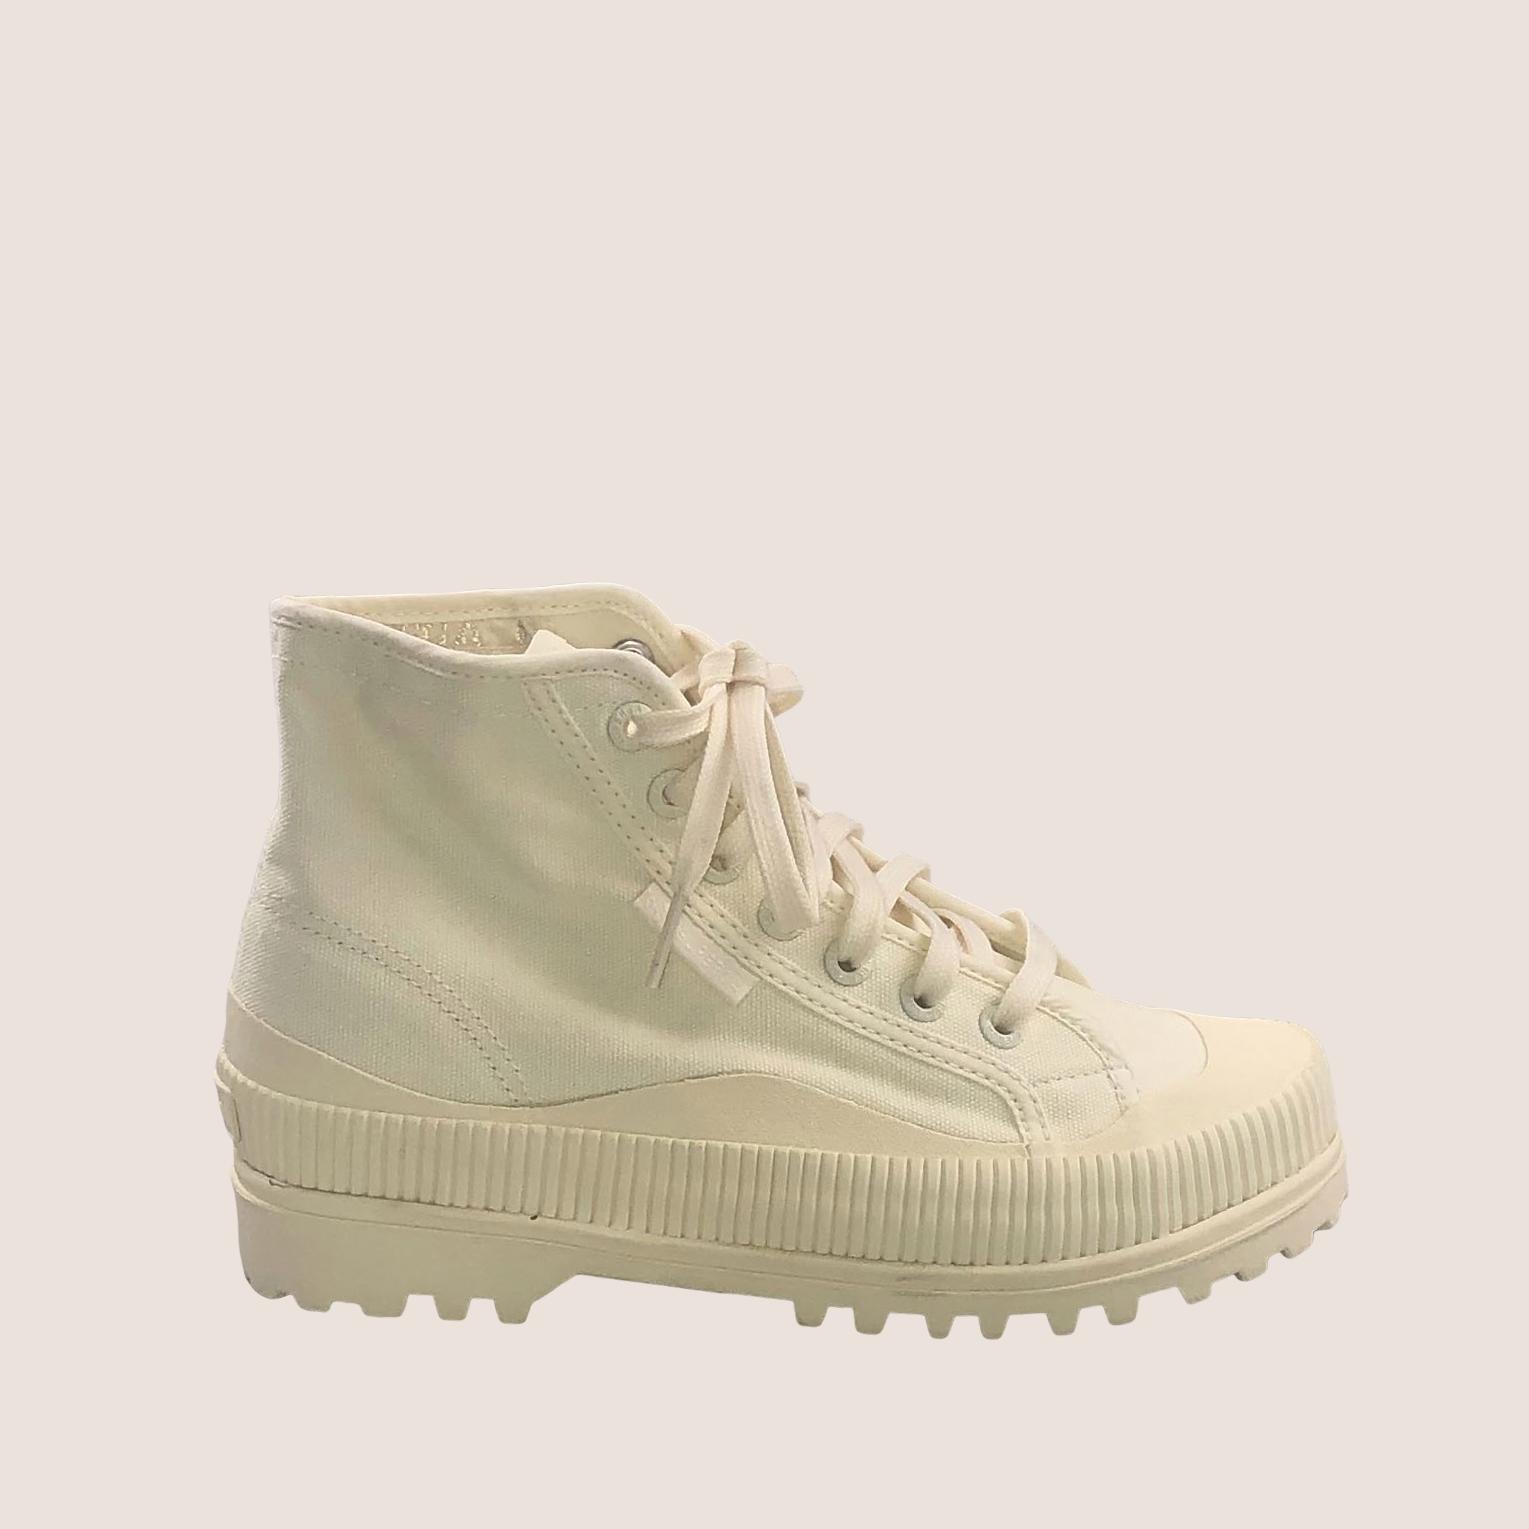 Alpina Boot